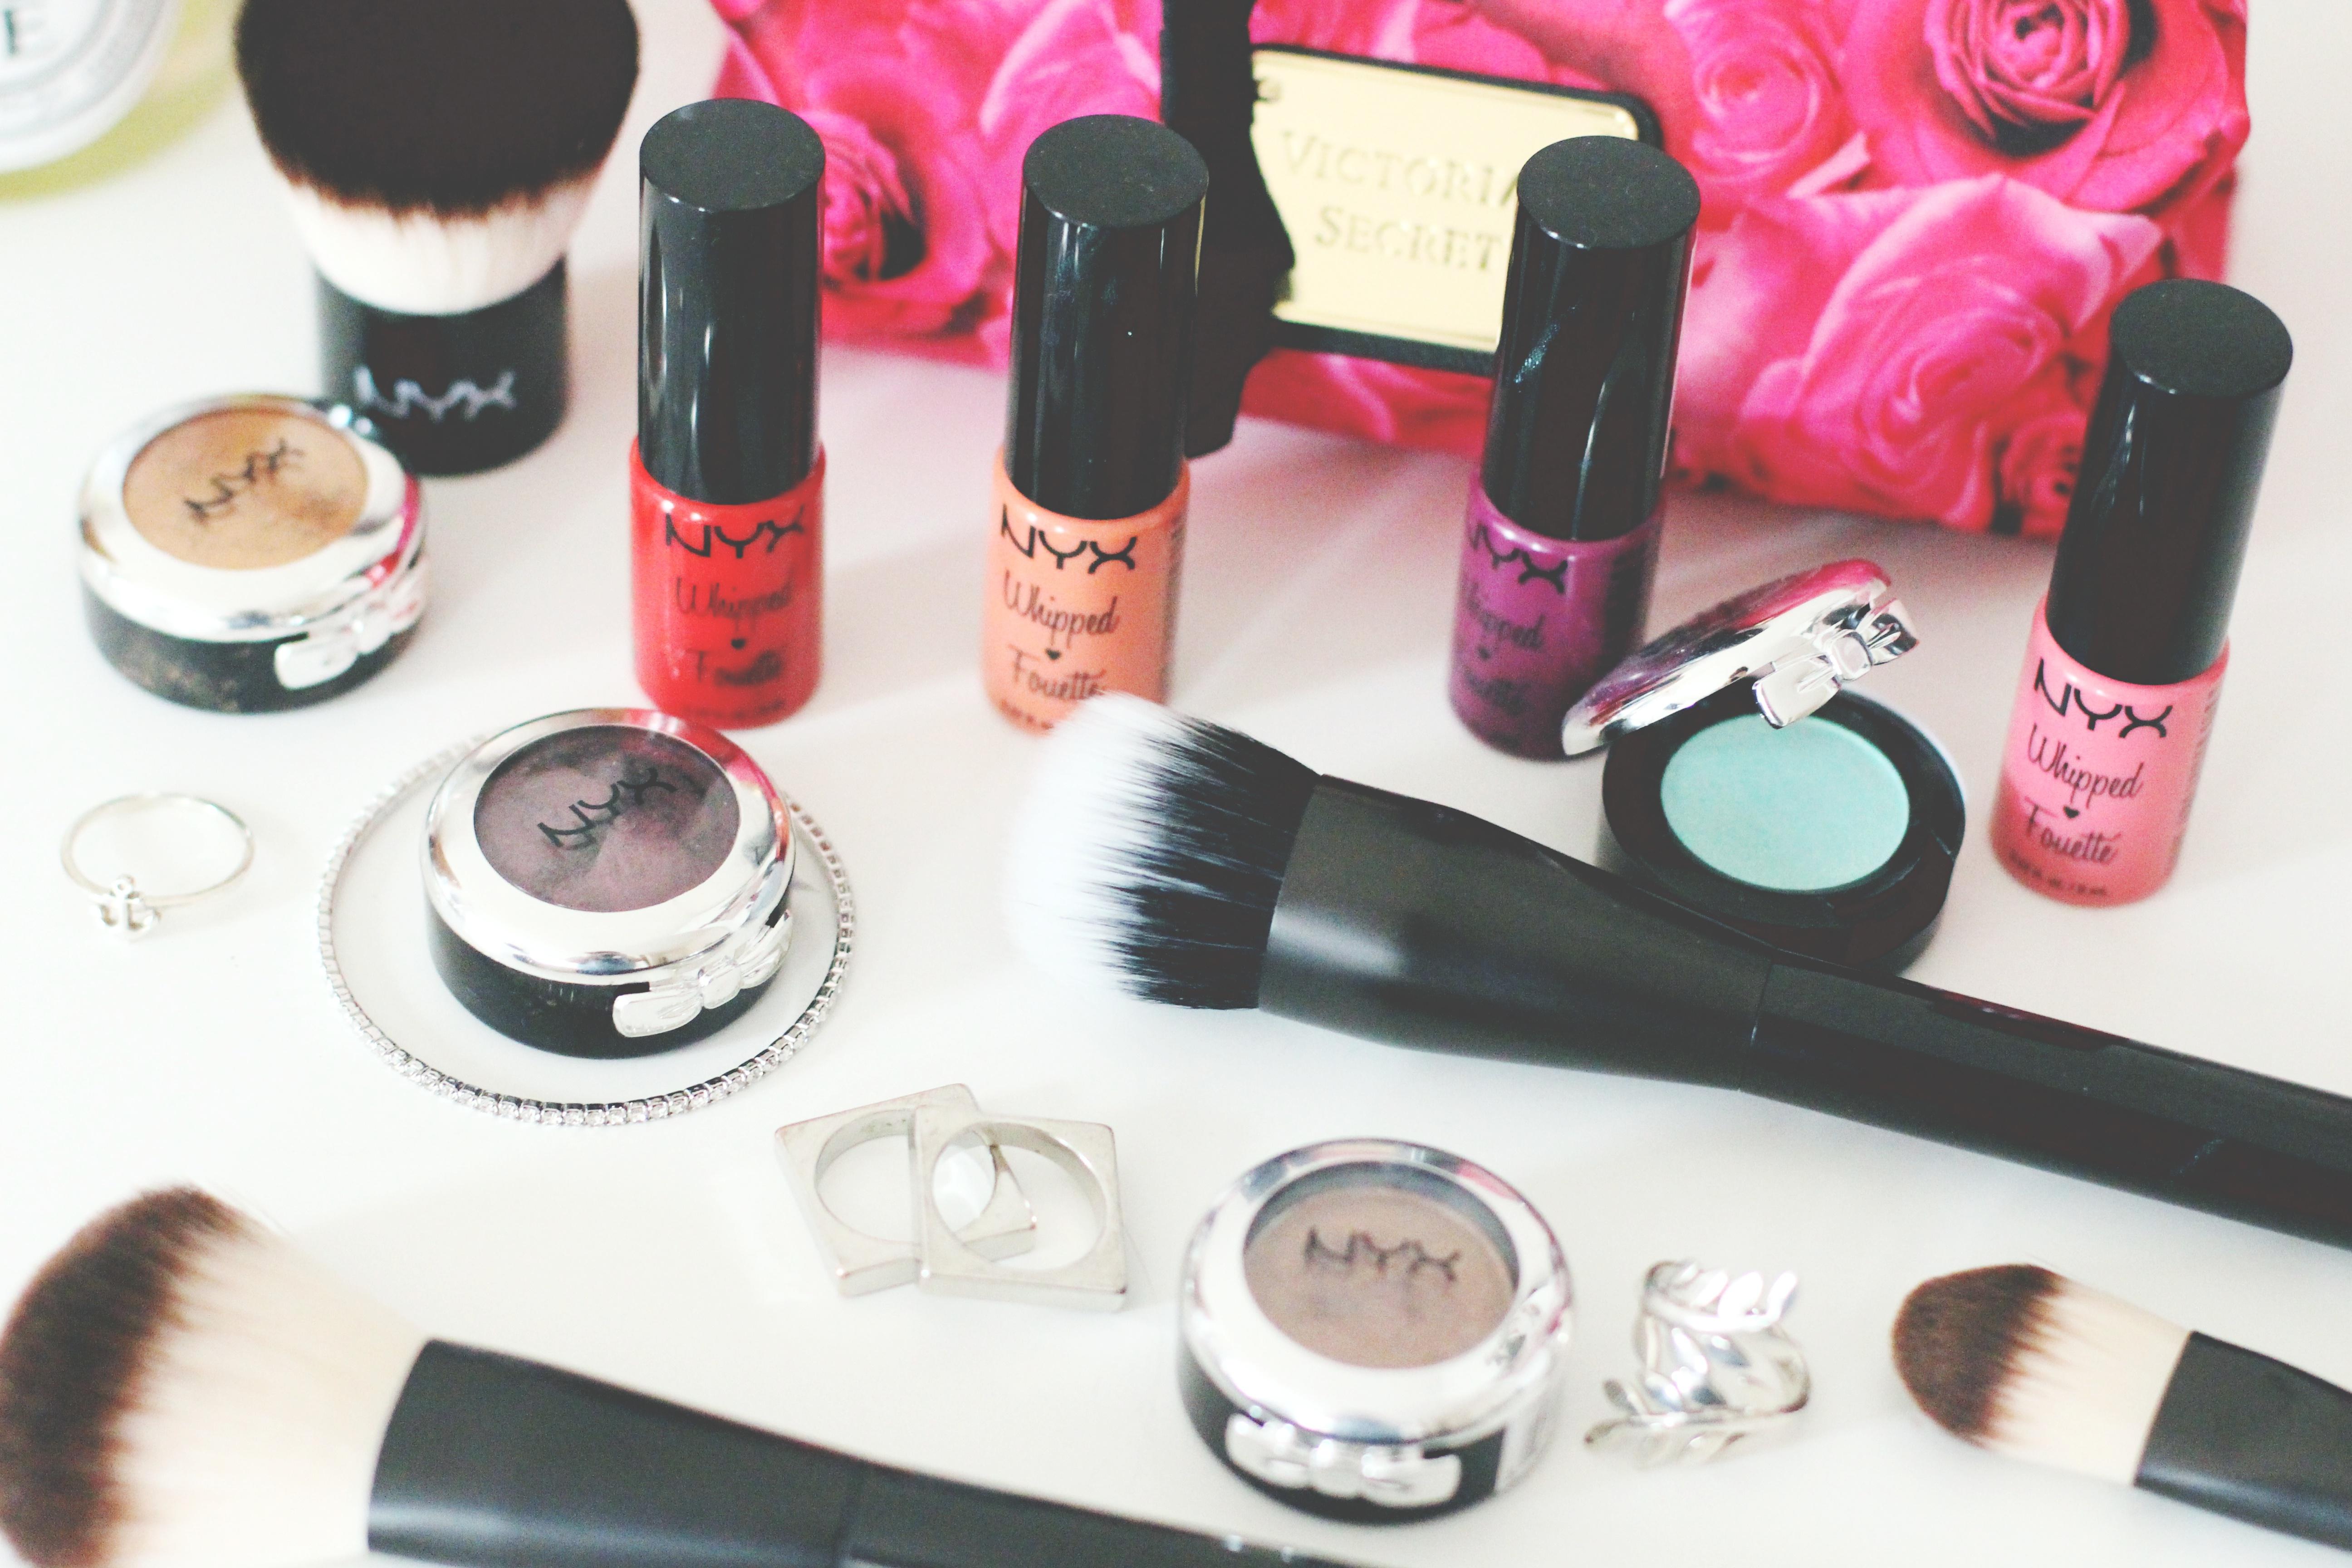 nouveautés nyx cosmetics